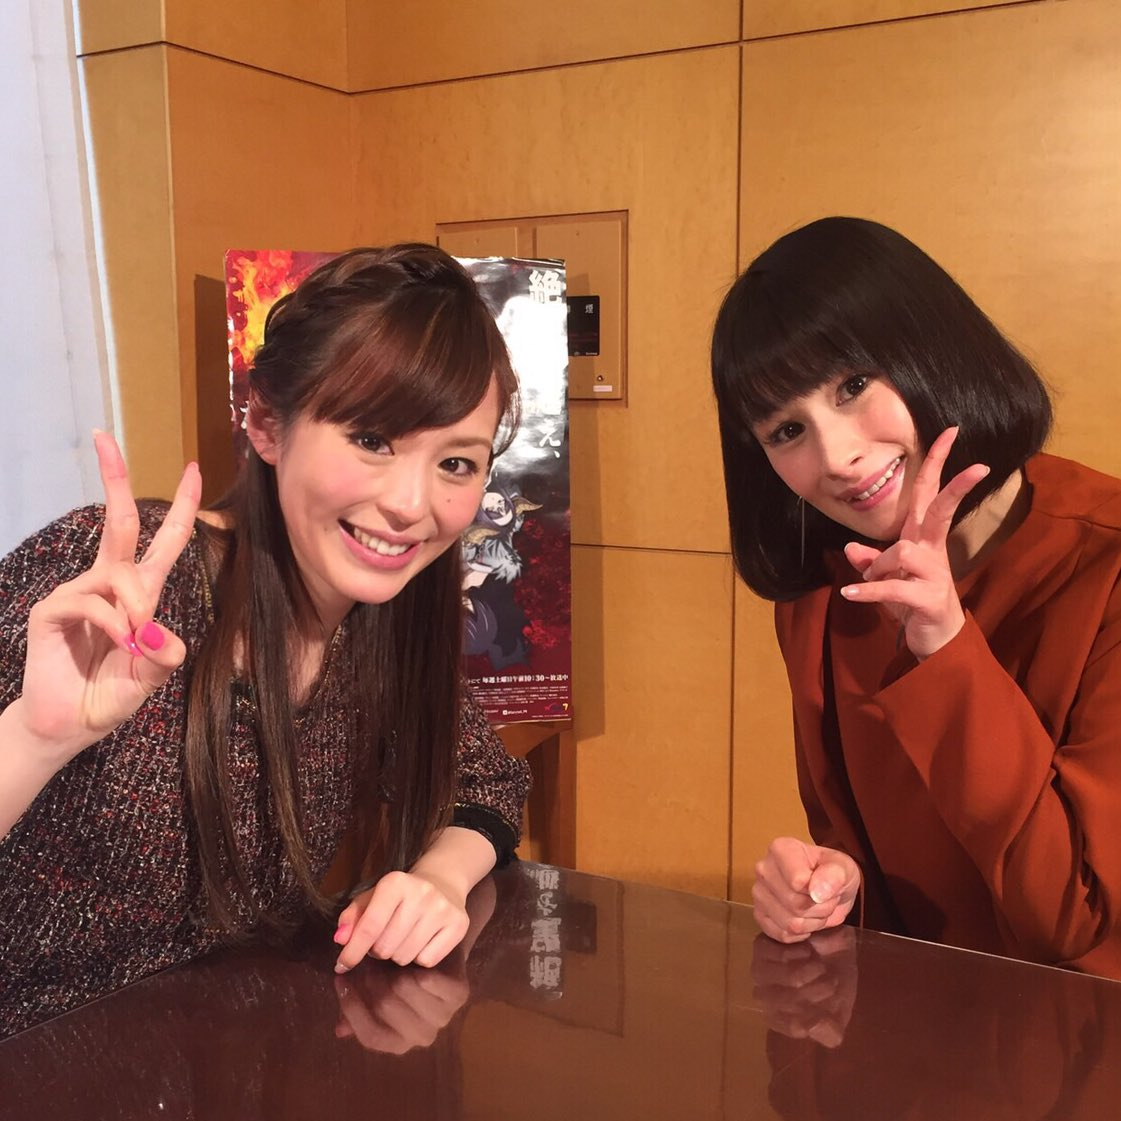 【DVDリリース情報】月刊FAIRY TAILコレクションVol.9☆彡特典映像のゲストはジュビア役中原麻衣さん‼︎アニ